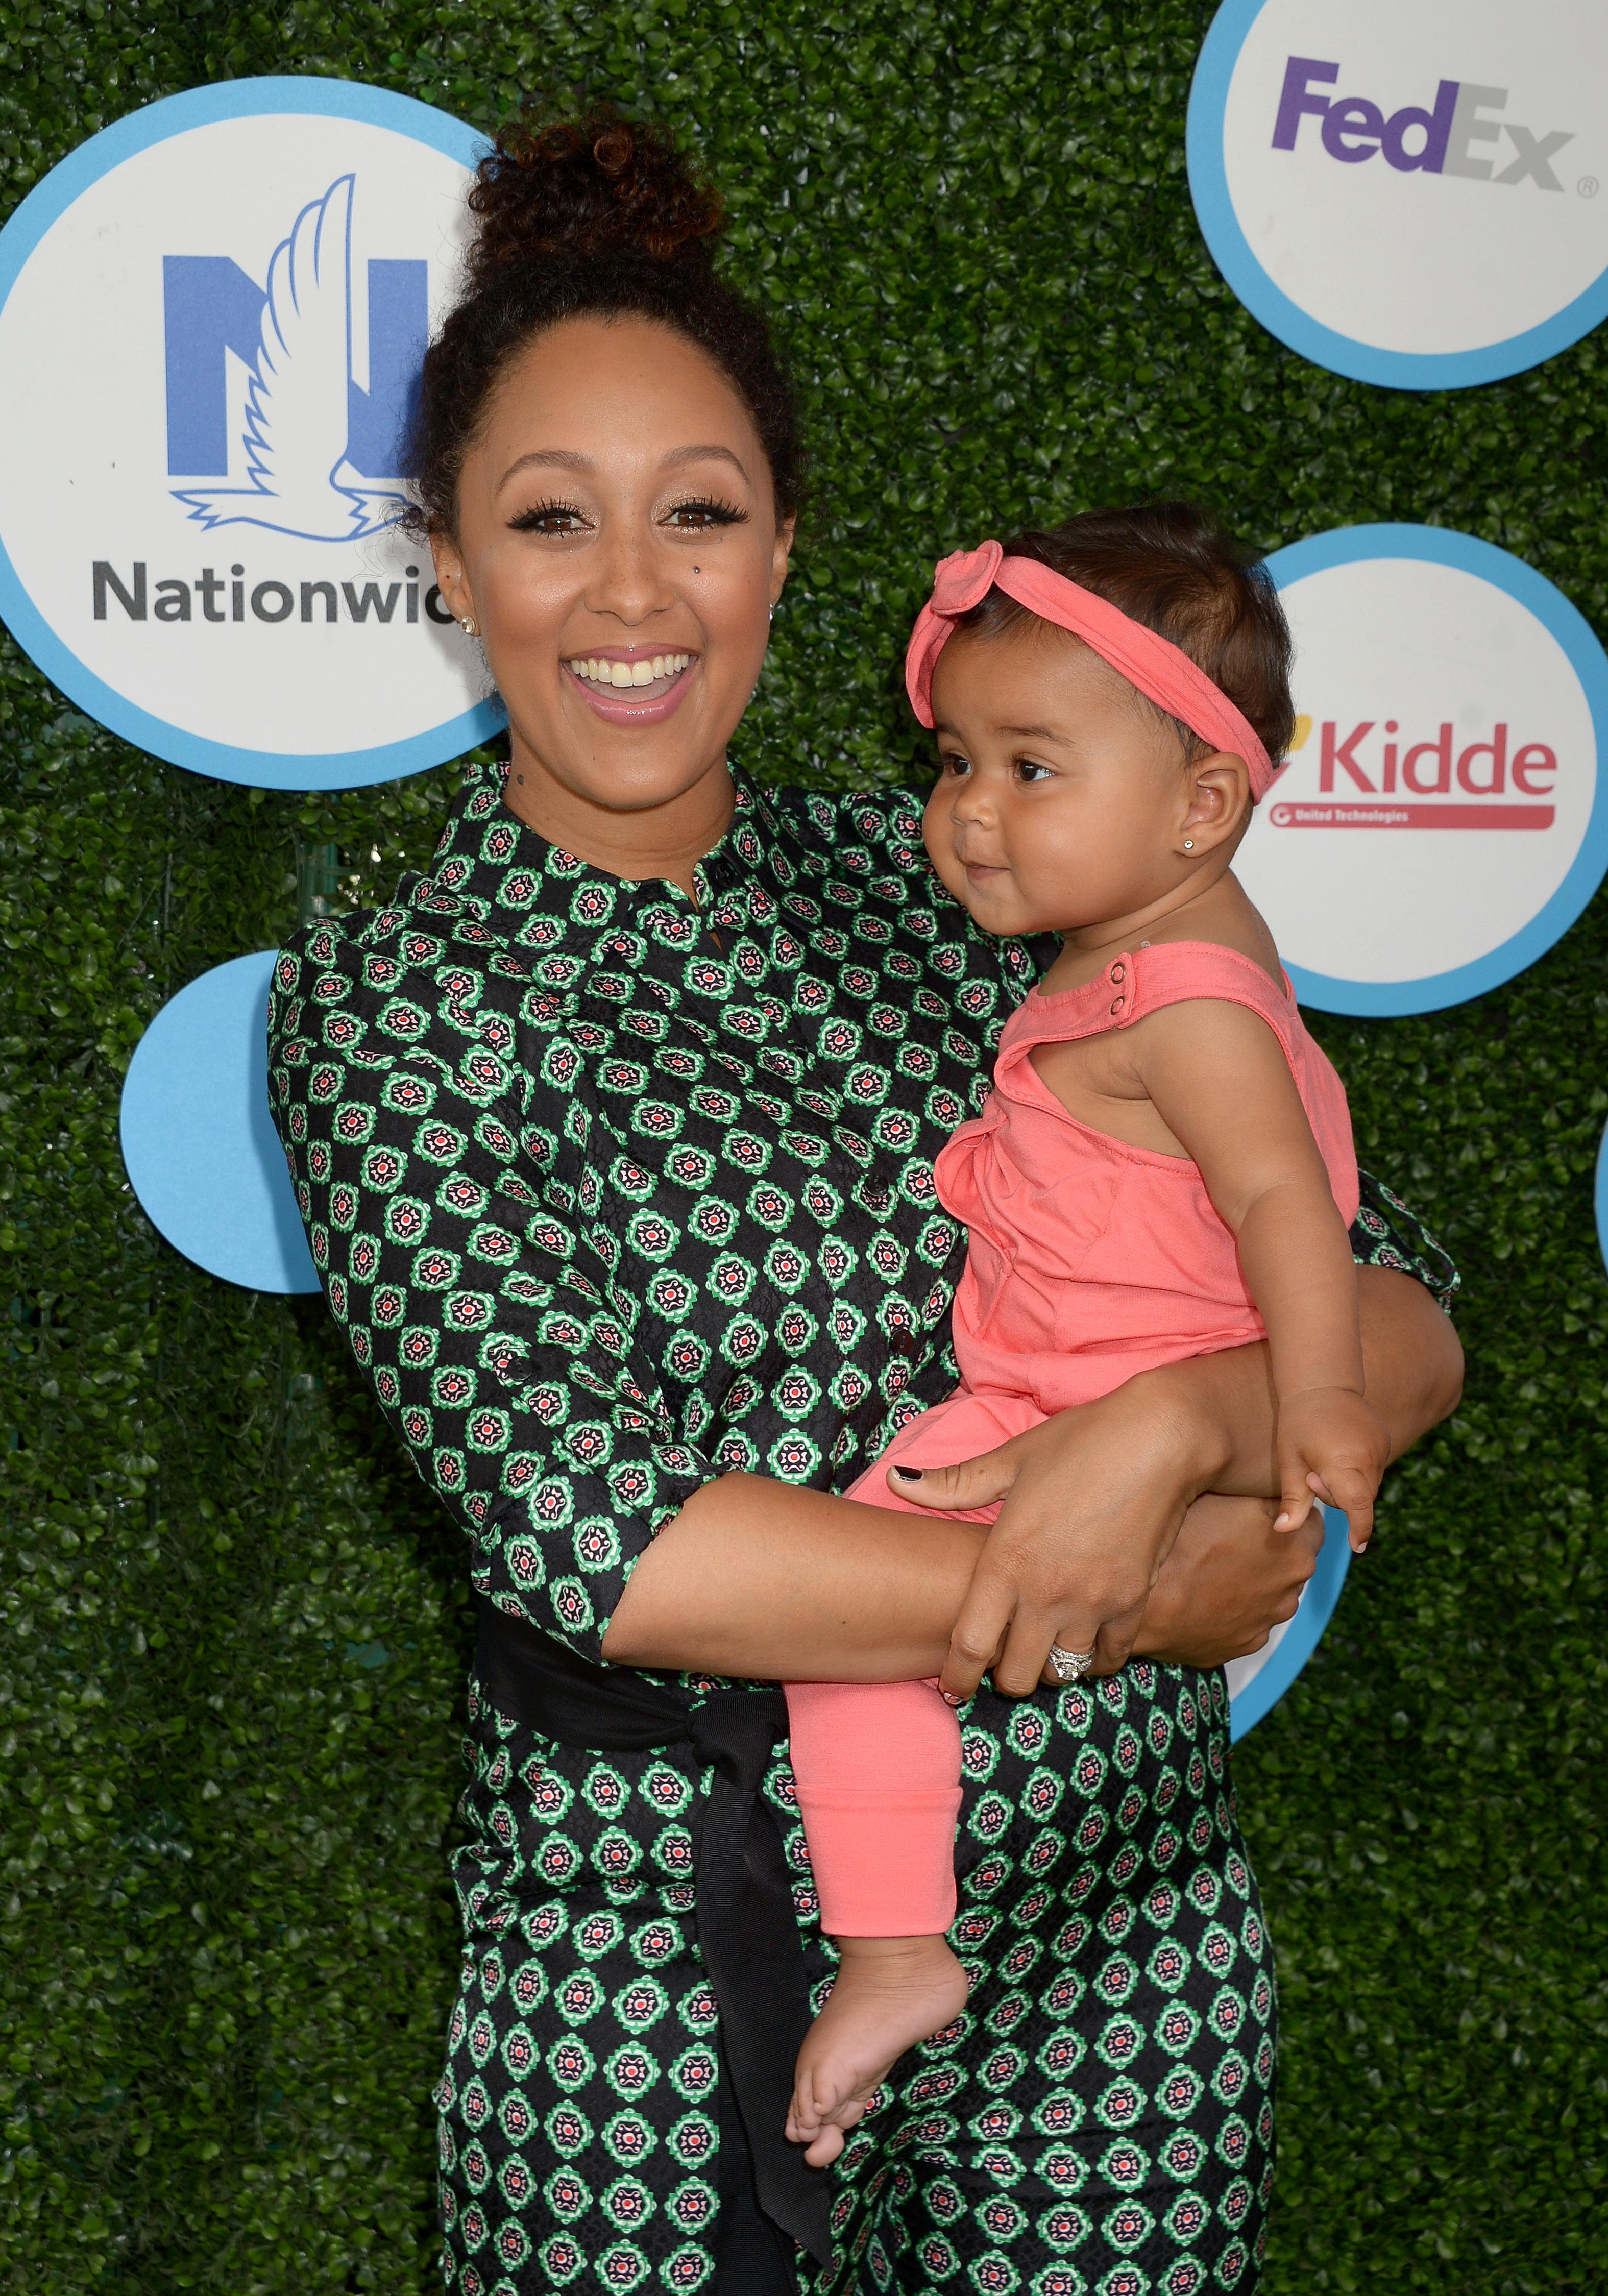 Tamera Mowry on Total Wireless' Total Boss Mom Program: